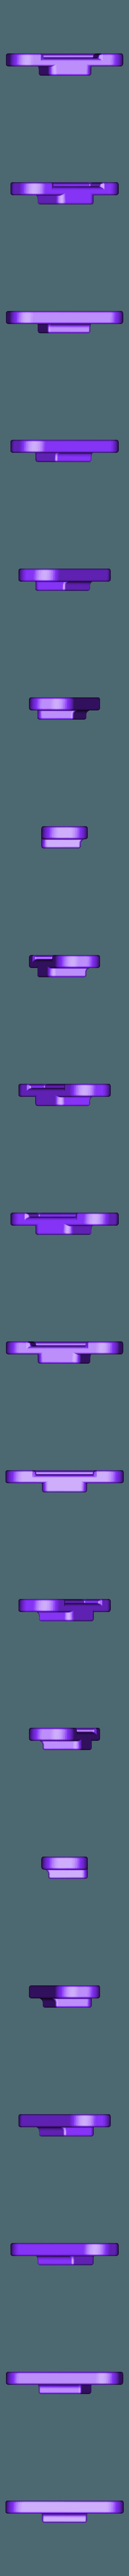 kawasaki-version2.STL Download free STL file Kawasaki Versys 650 Seat riser • 3D printable template, chriswiseman74